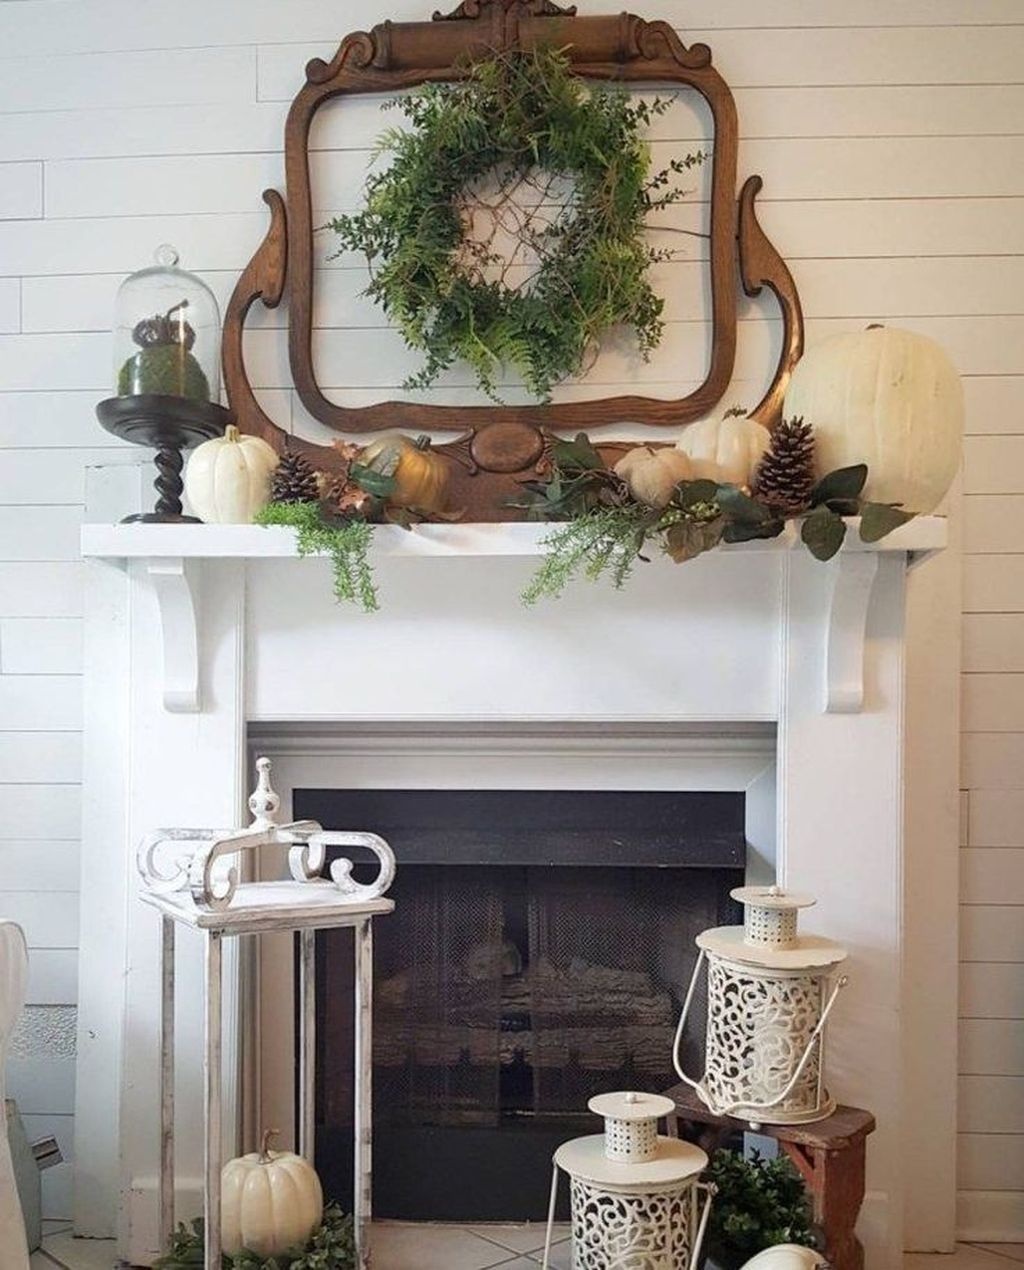 46 Awesome Farmhouse Fall Decor Ideas Perfect For Any Room Model